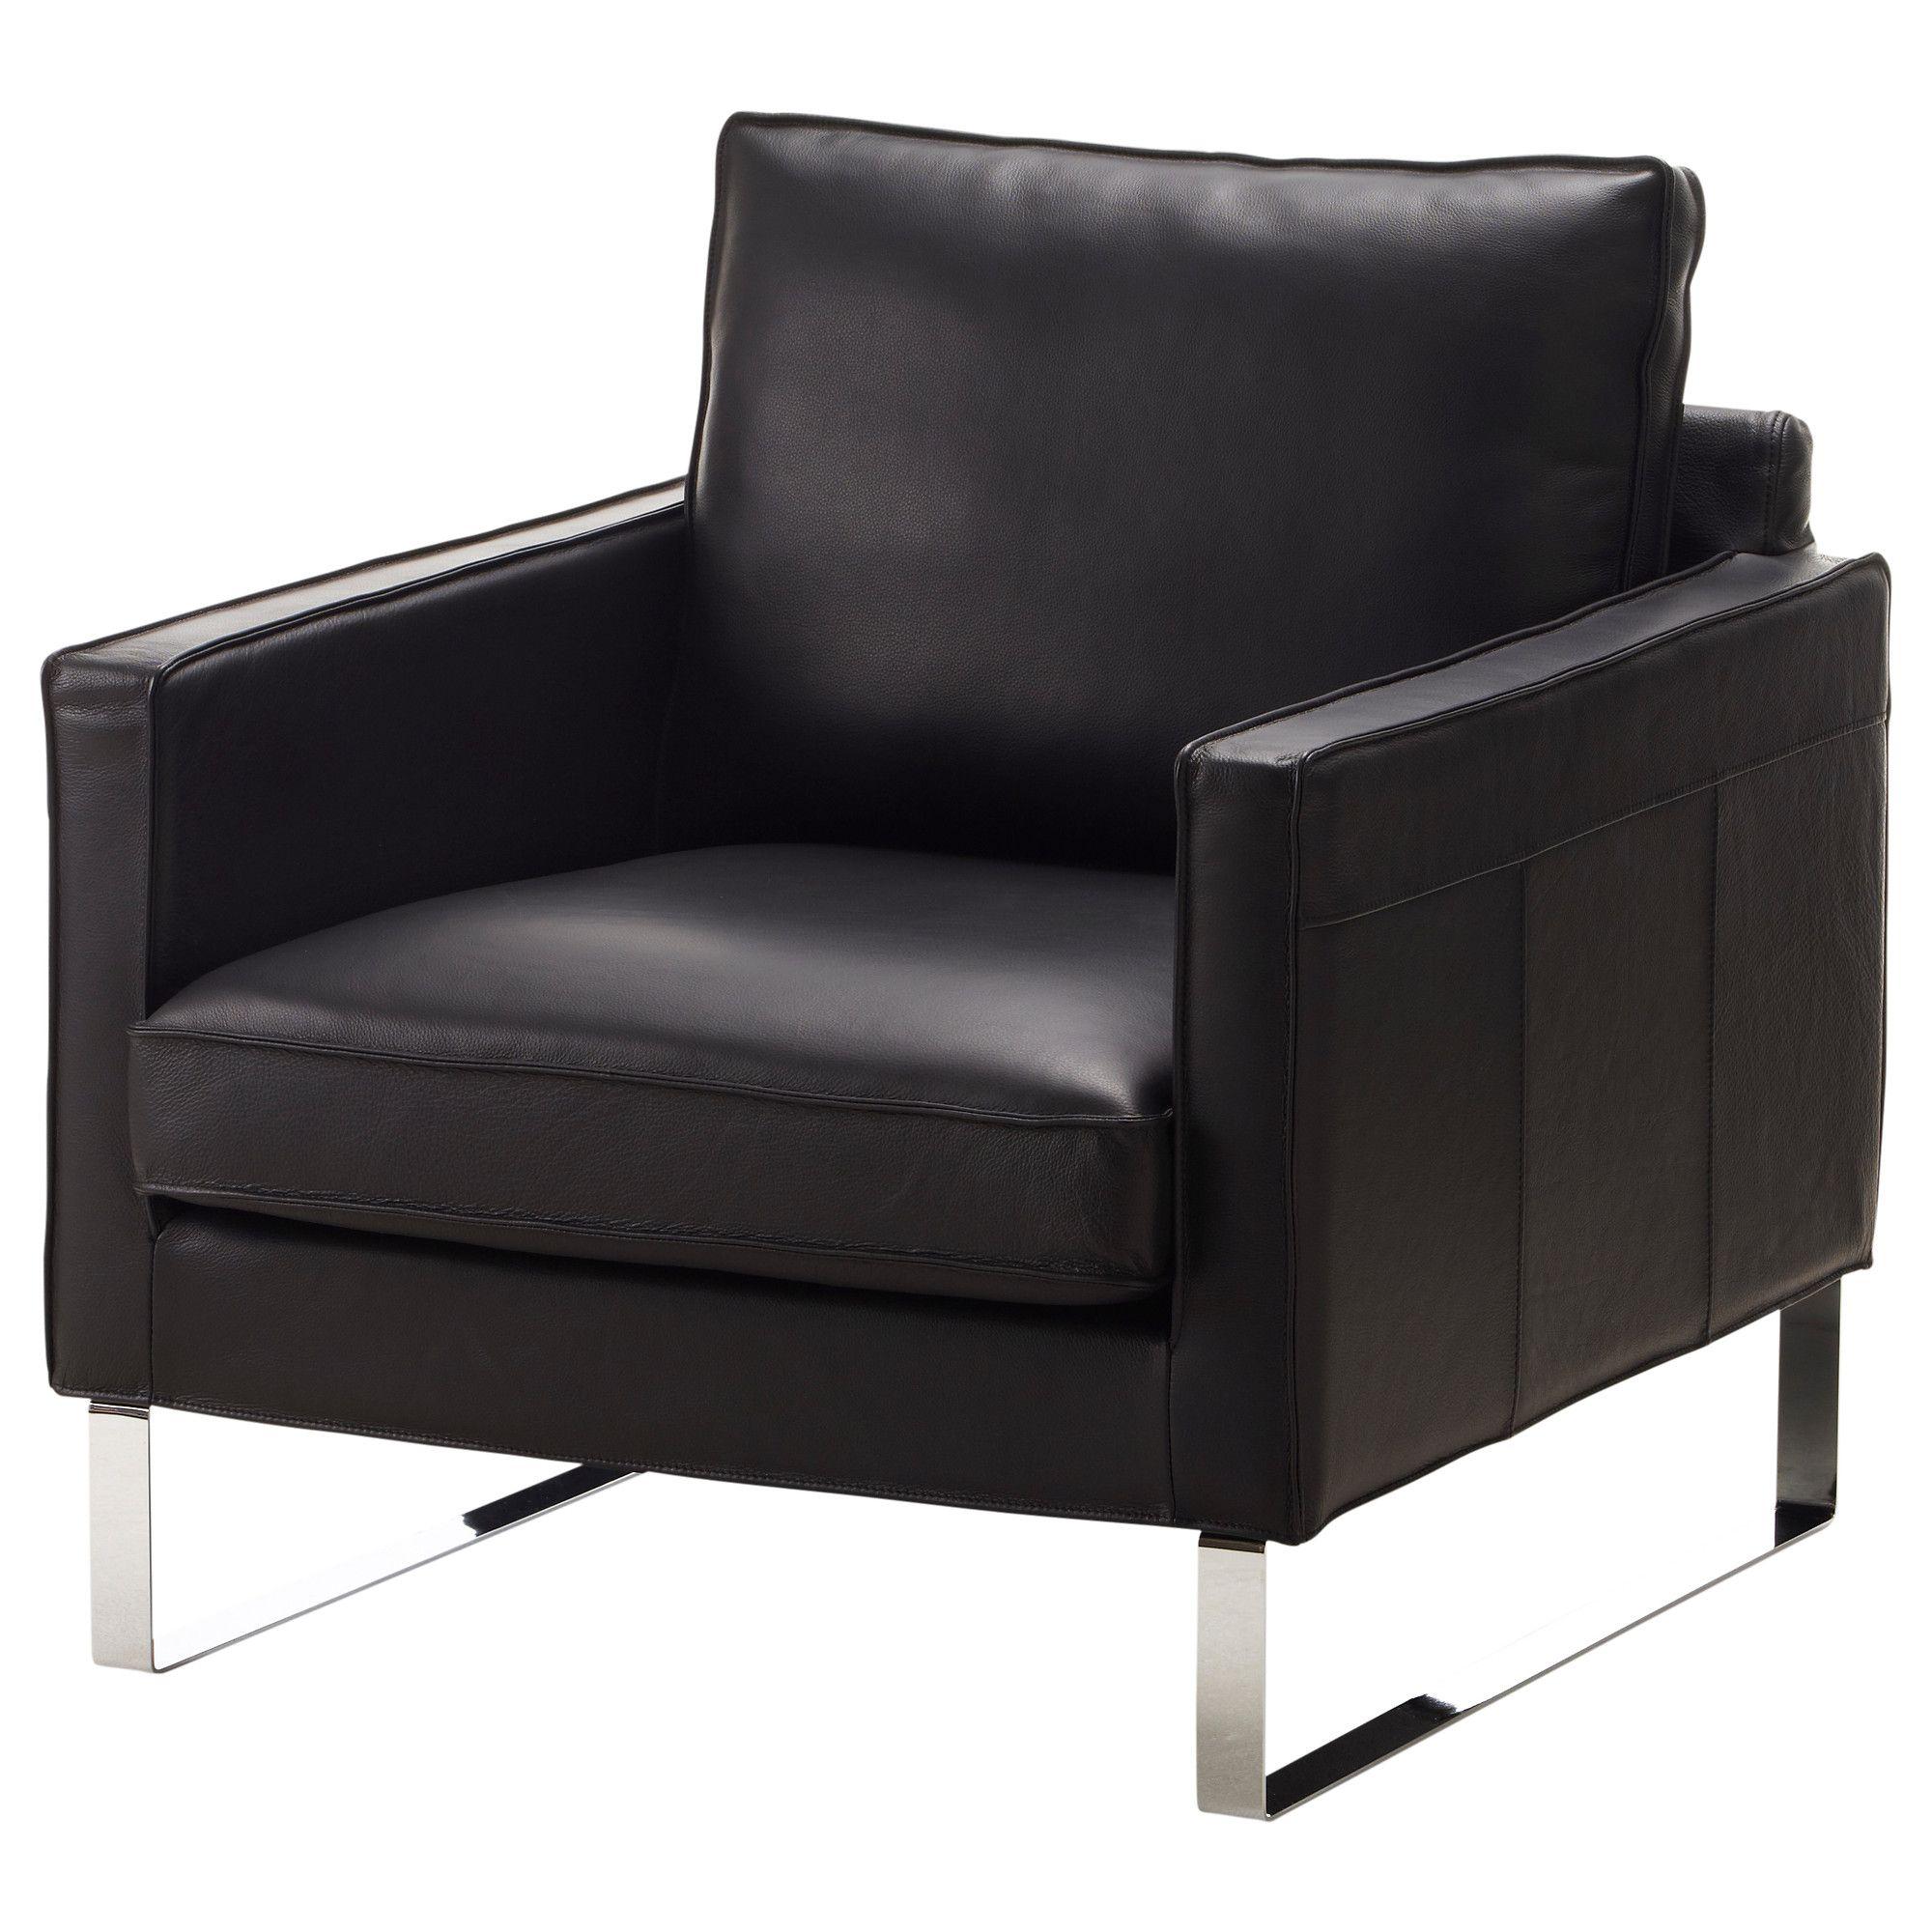 Black Leather Sofa Office: MELLBY Chair - Grann Black - IKEA